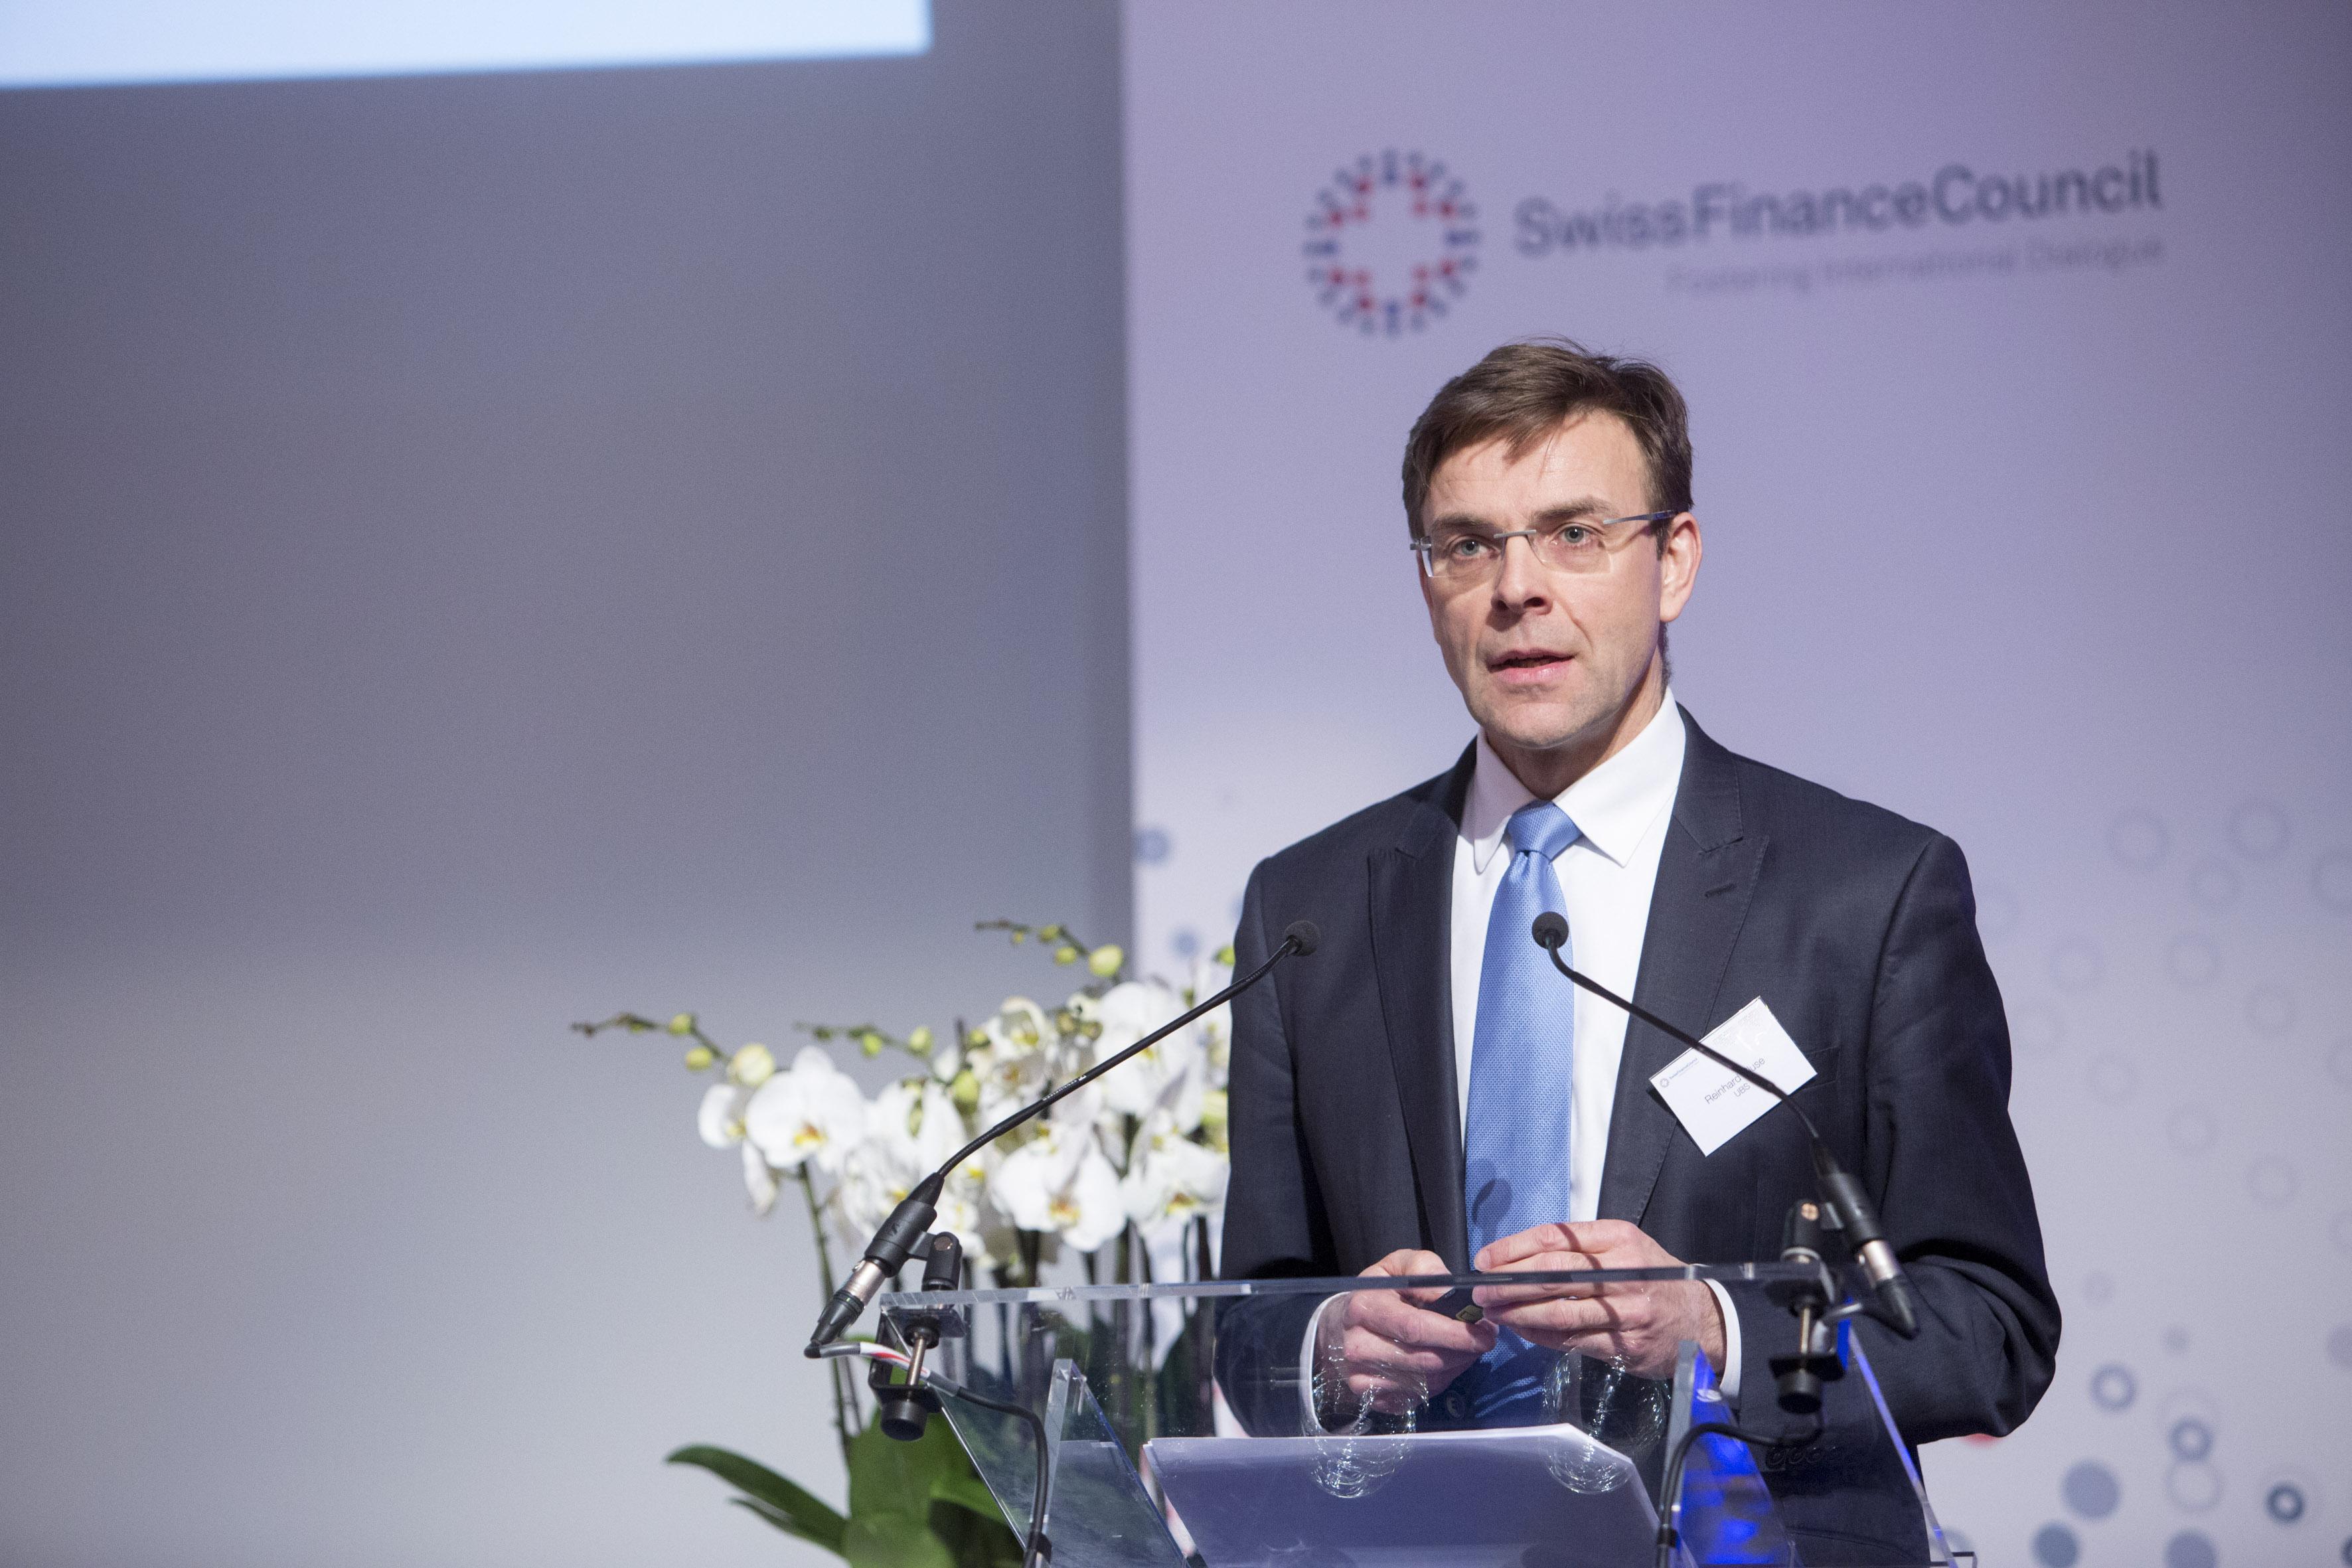 20150218_QED_SwissFinancialCouncil_Haulot_289